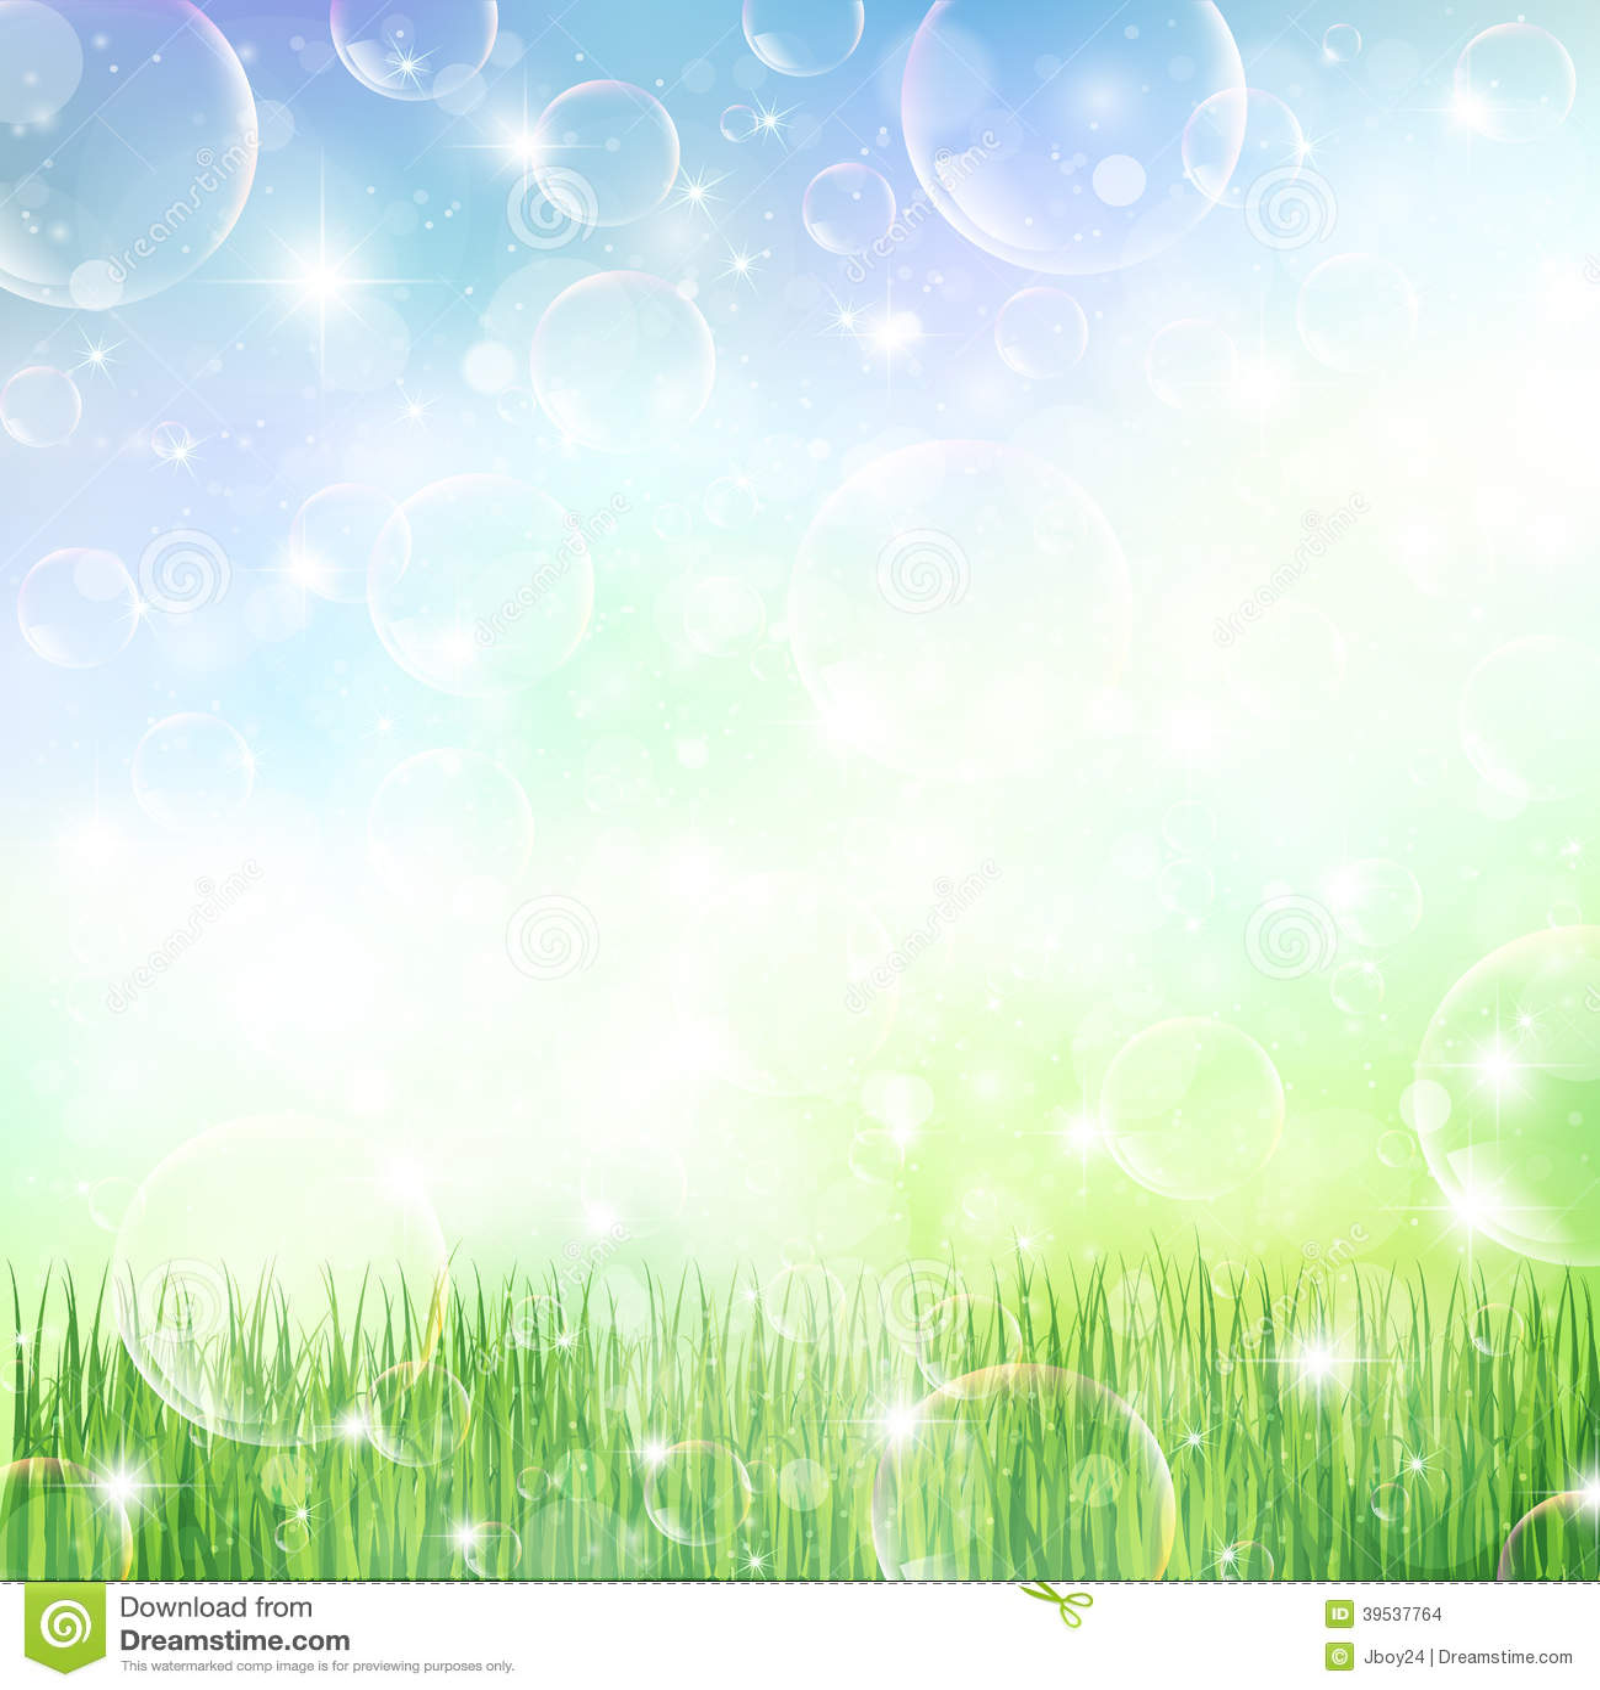 Sky Grass Landscape Stock Vector - Image: 39537764